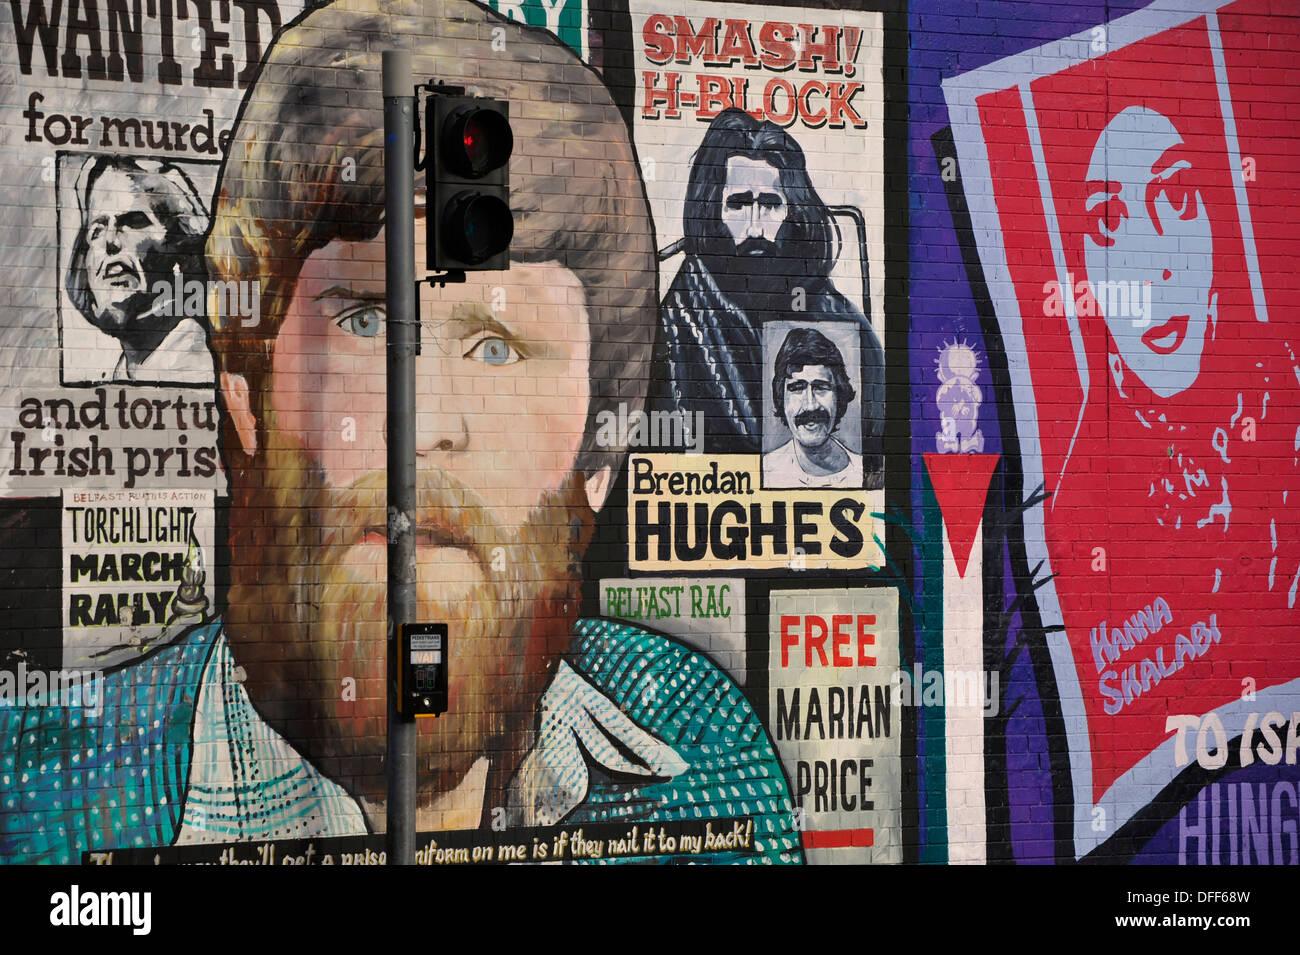 GBR, Nordirland, Belfast, Gaeltacht Quarter, 02.11.2012, International Wall in the Falls Road in West Belfast. Stock Photo